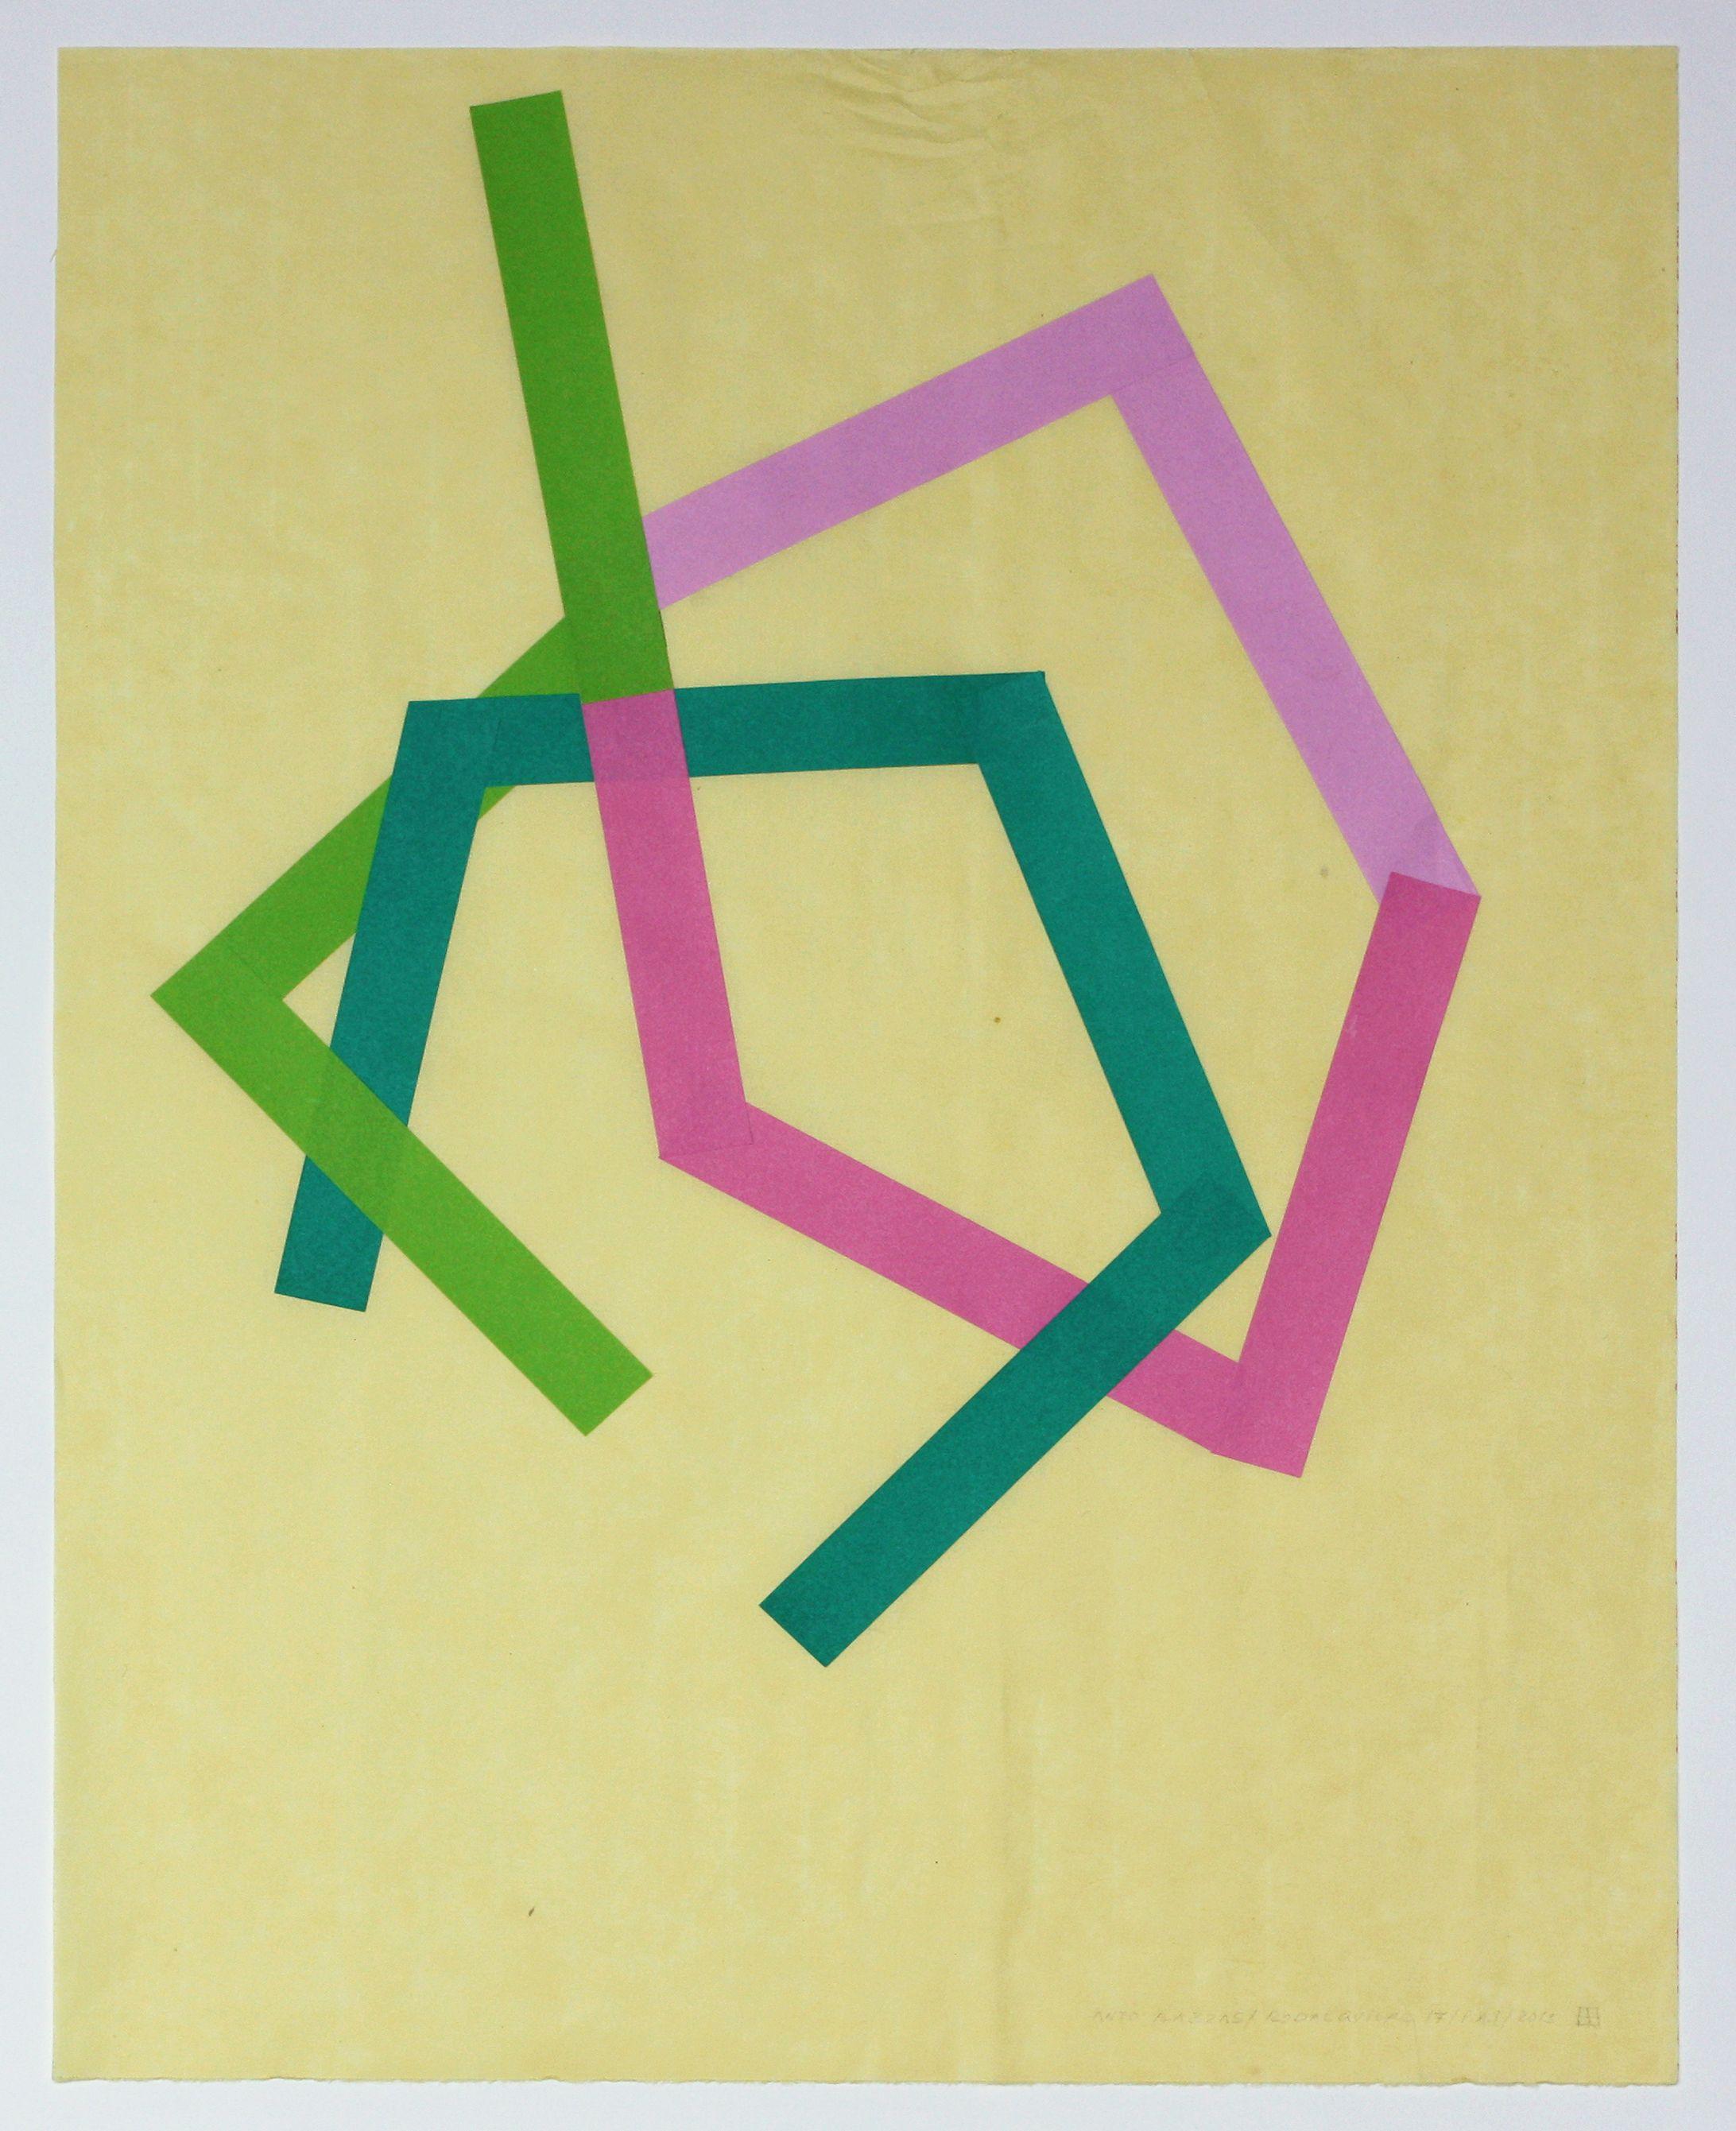 Anto Rabzas / Serie Rodalquilar 17 / PA. 1 / 2015 Collage sobre papel de arroz 50 x 40 cm.